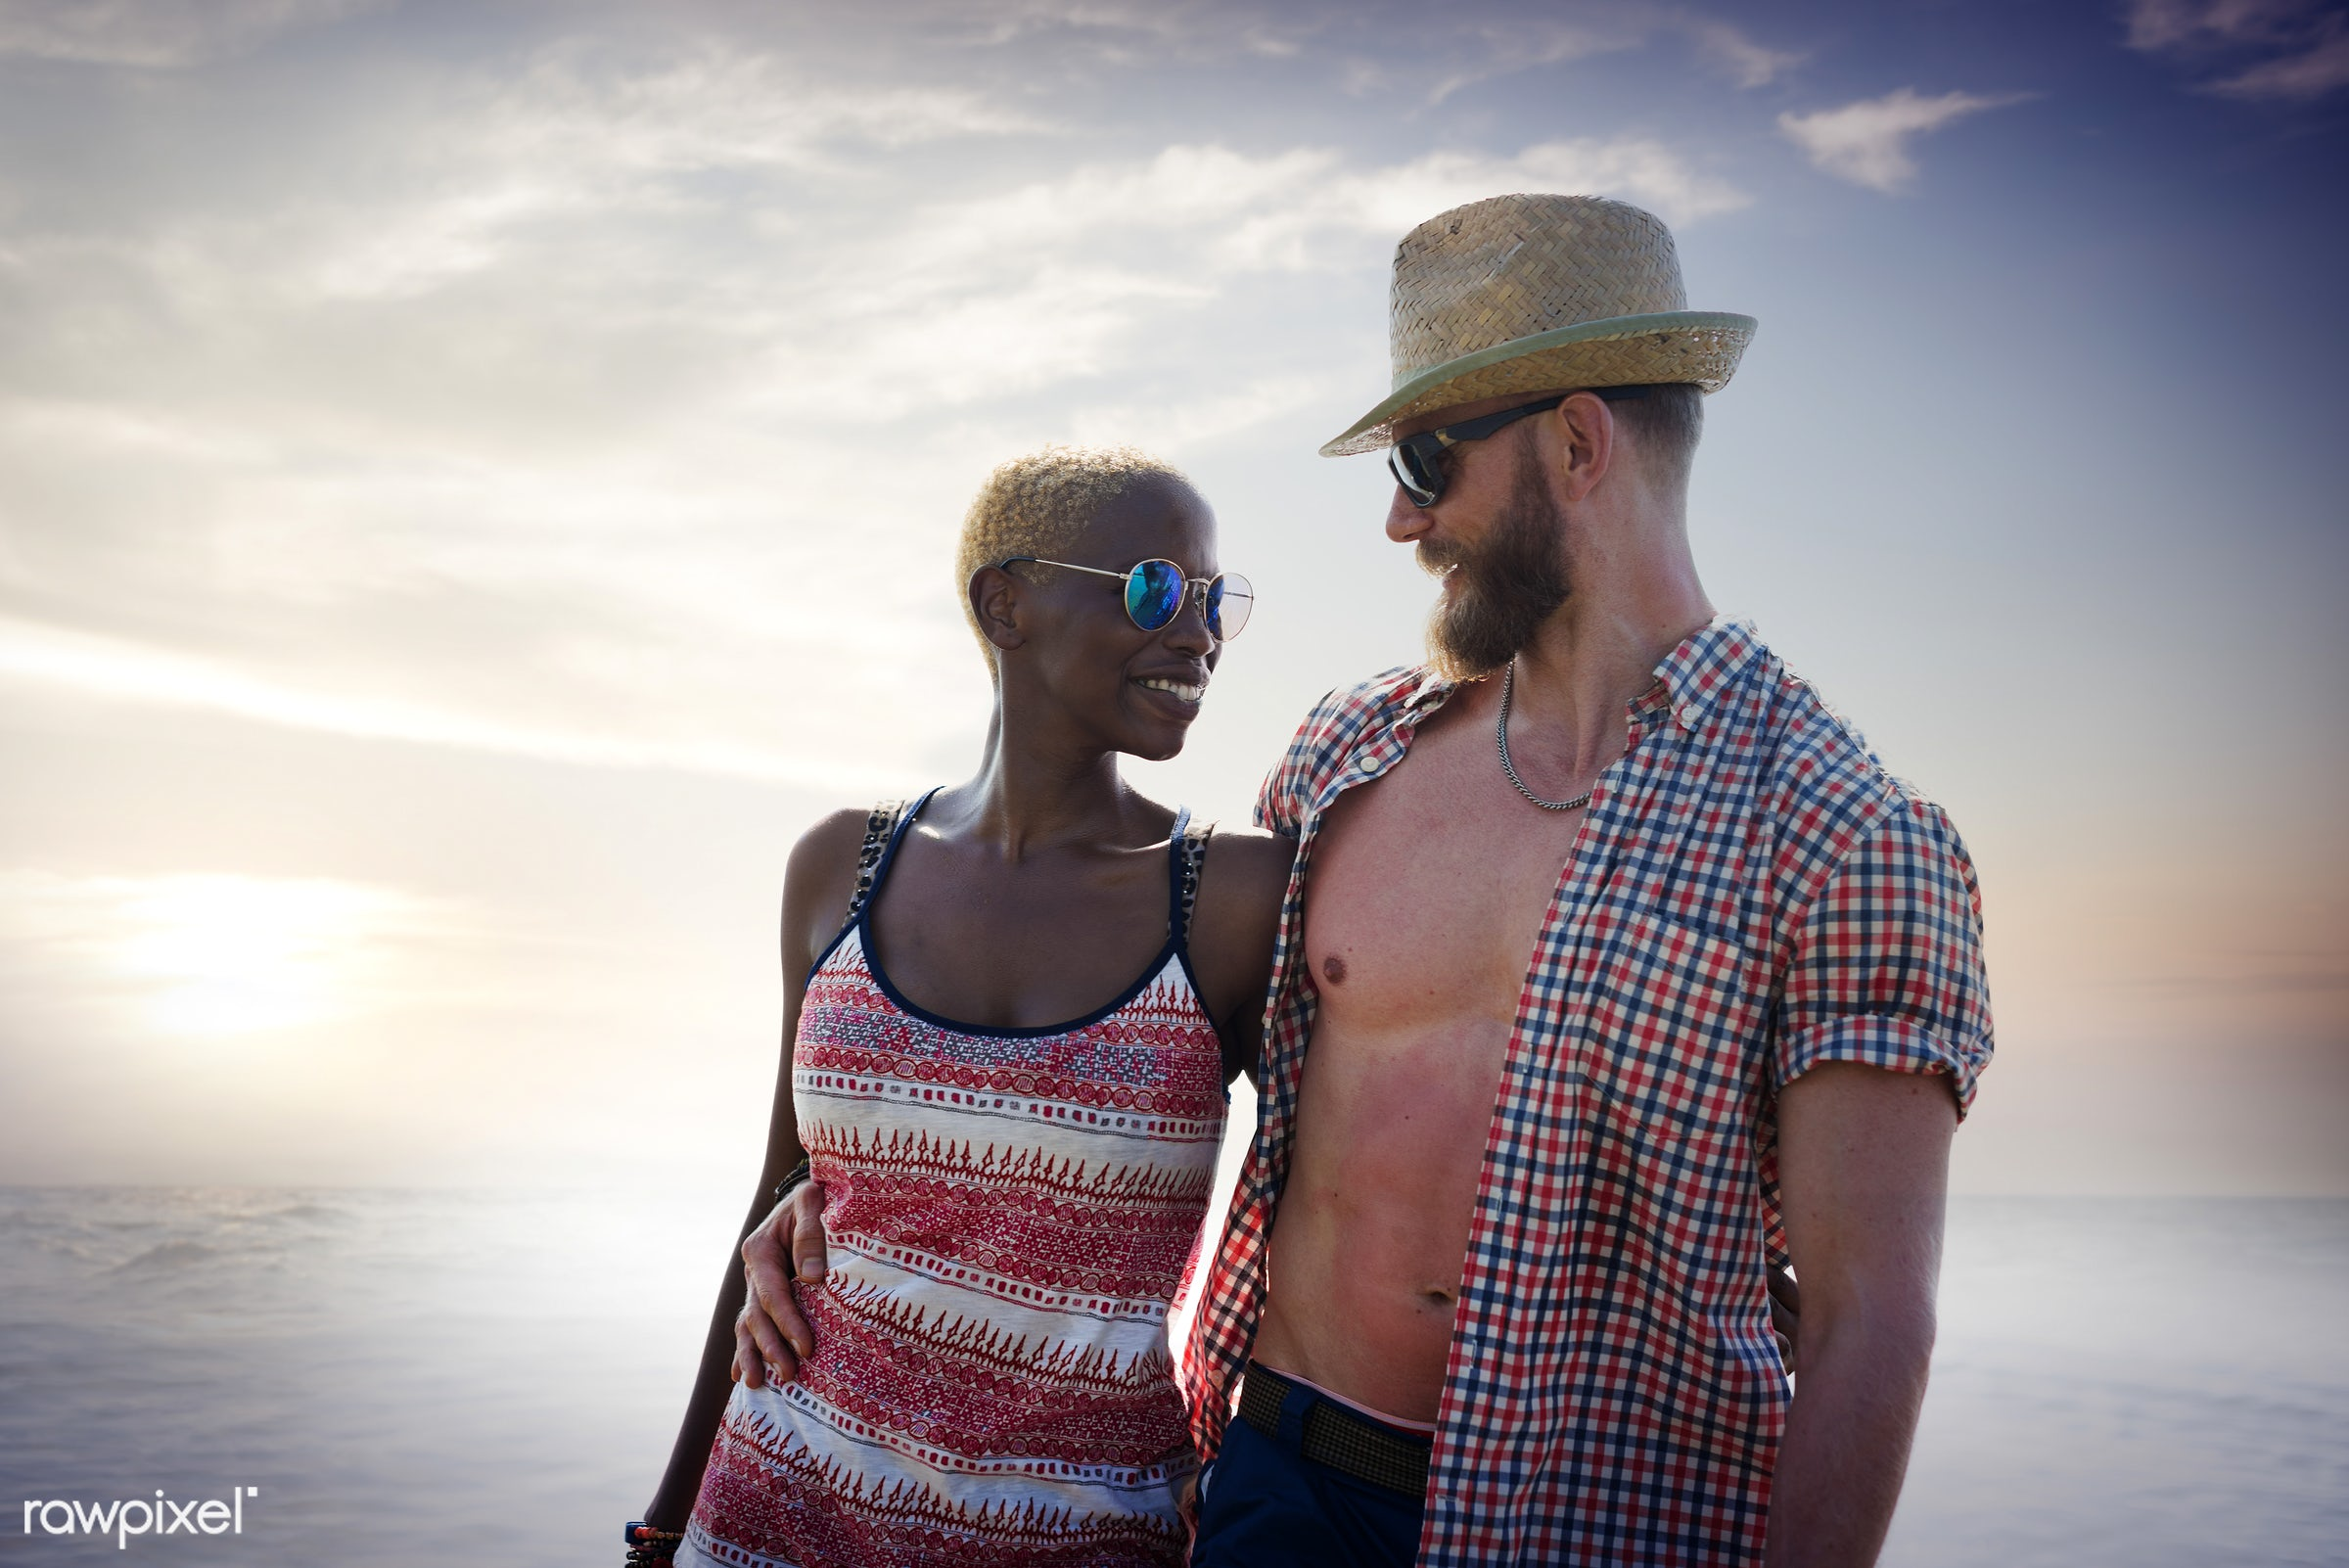 couple, bonding, horizon, ocean, smiling, summer, african descent, arm around, beach, boyfriend, cheerful, chilling,...